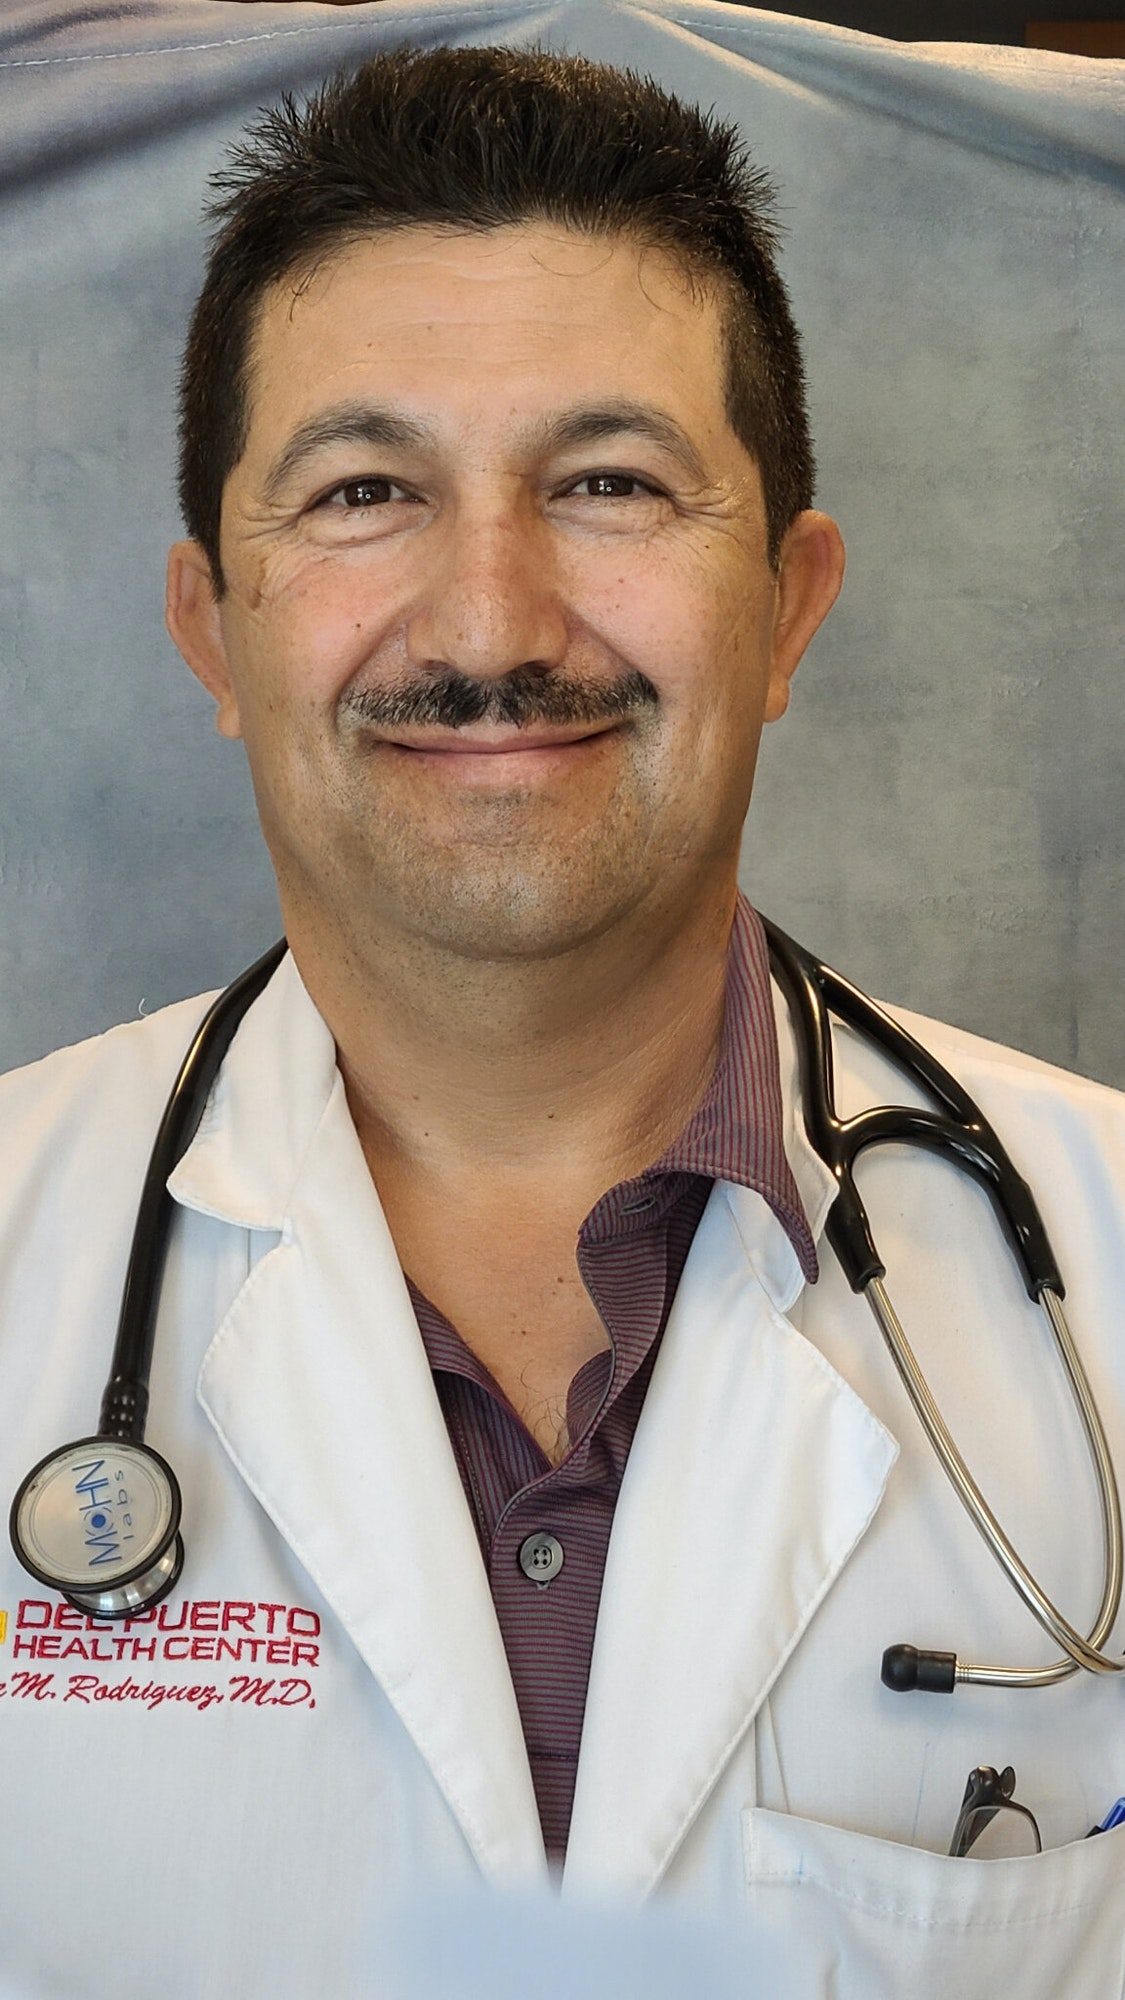 Dr. Jose M. Rodriguez